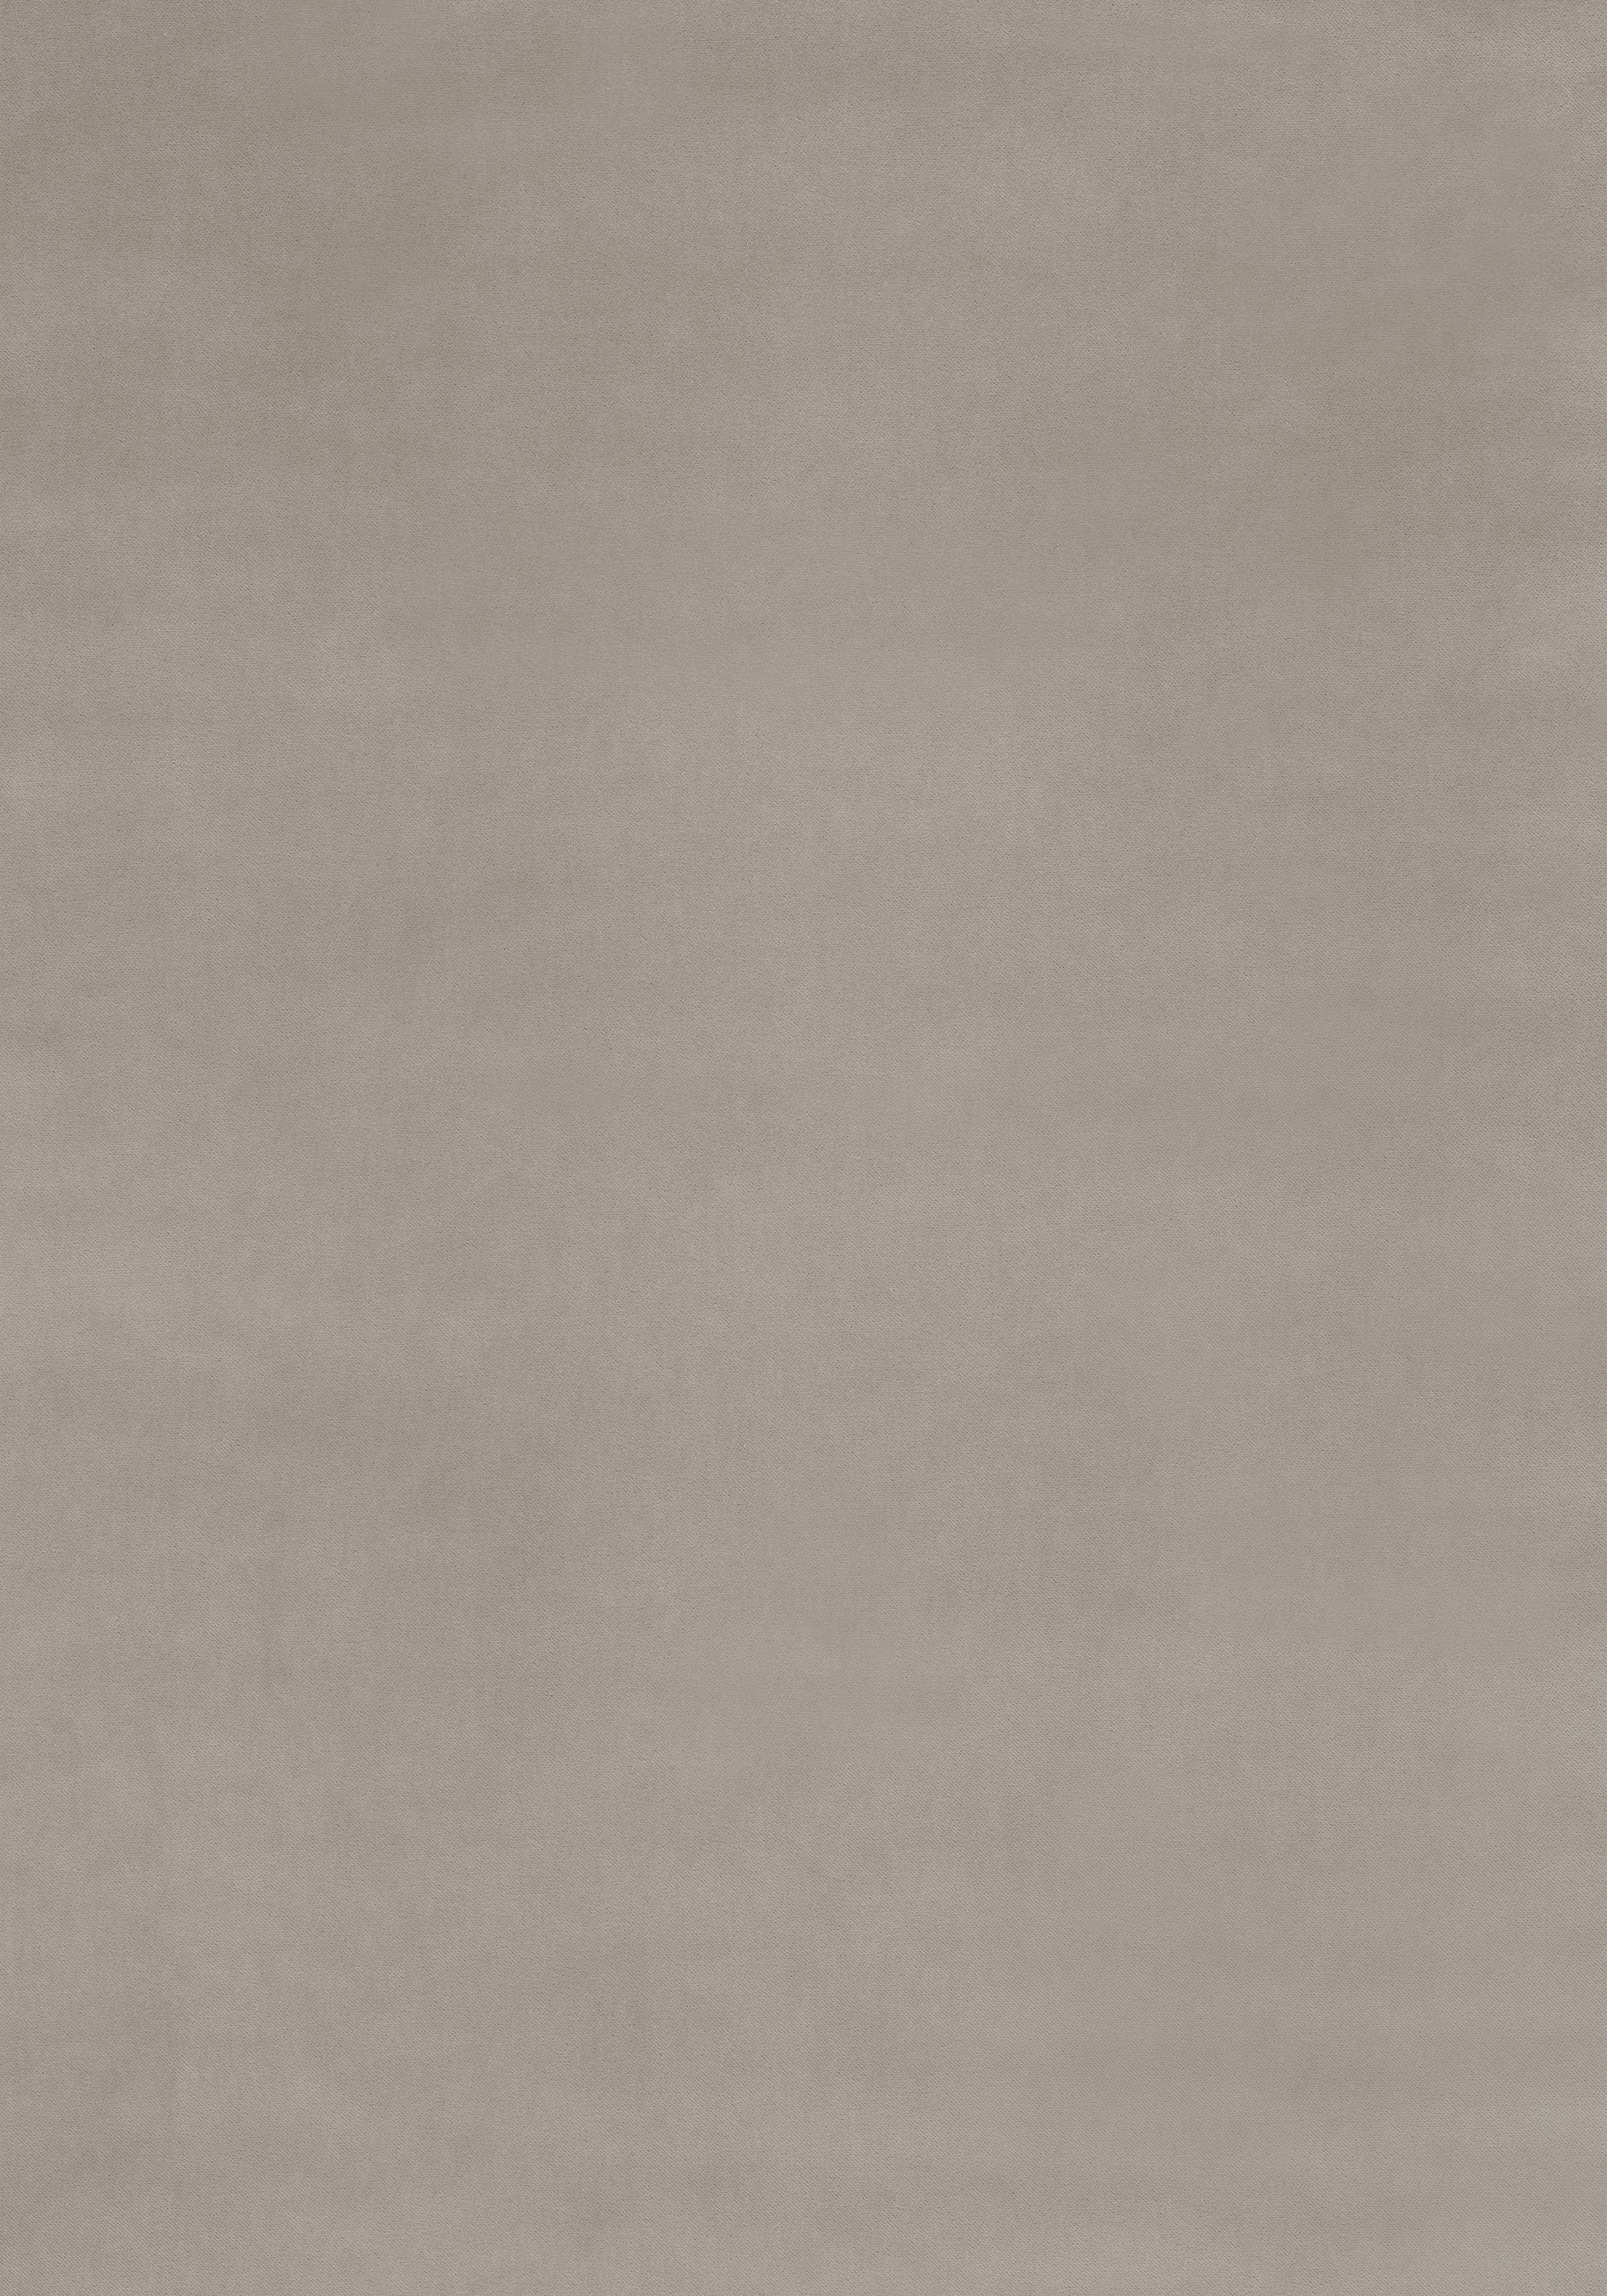 ESSEX VELVET, Smoke, W79454, Collection Woven 4: Velvets from Thibaut